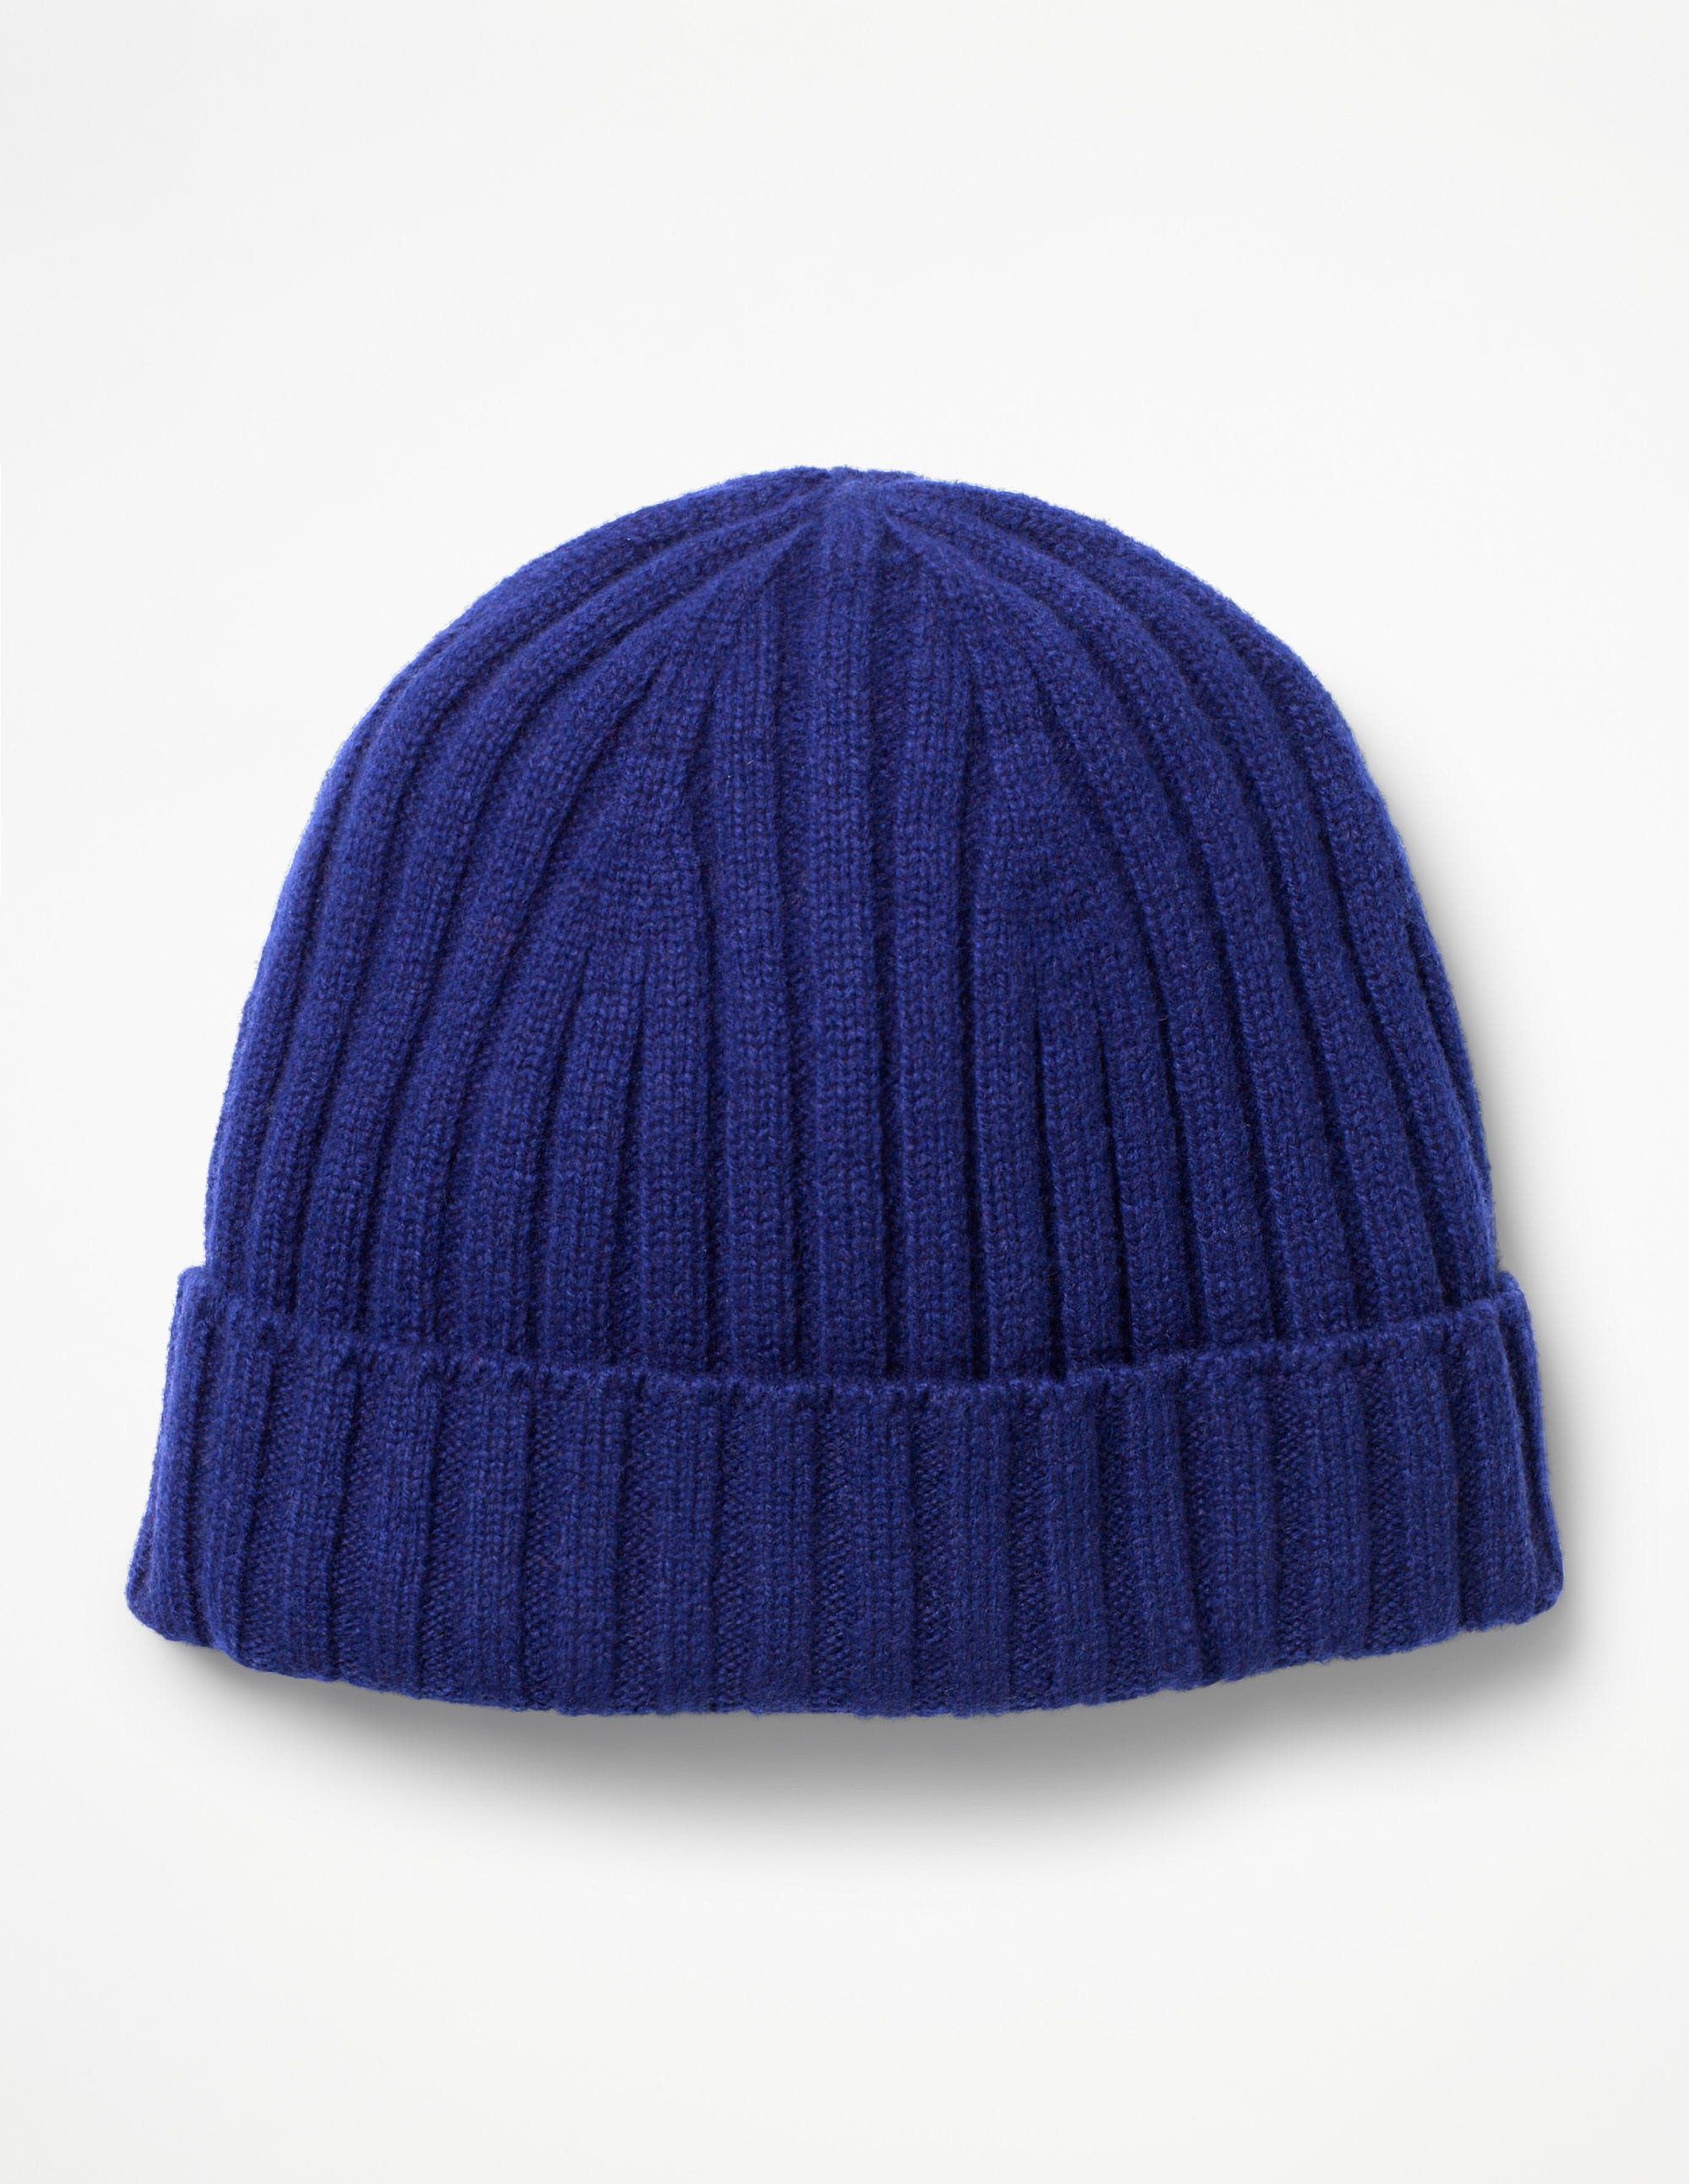 60a82bb8c0a Lambswool Hat - Ocean Blue